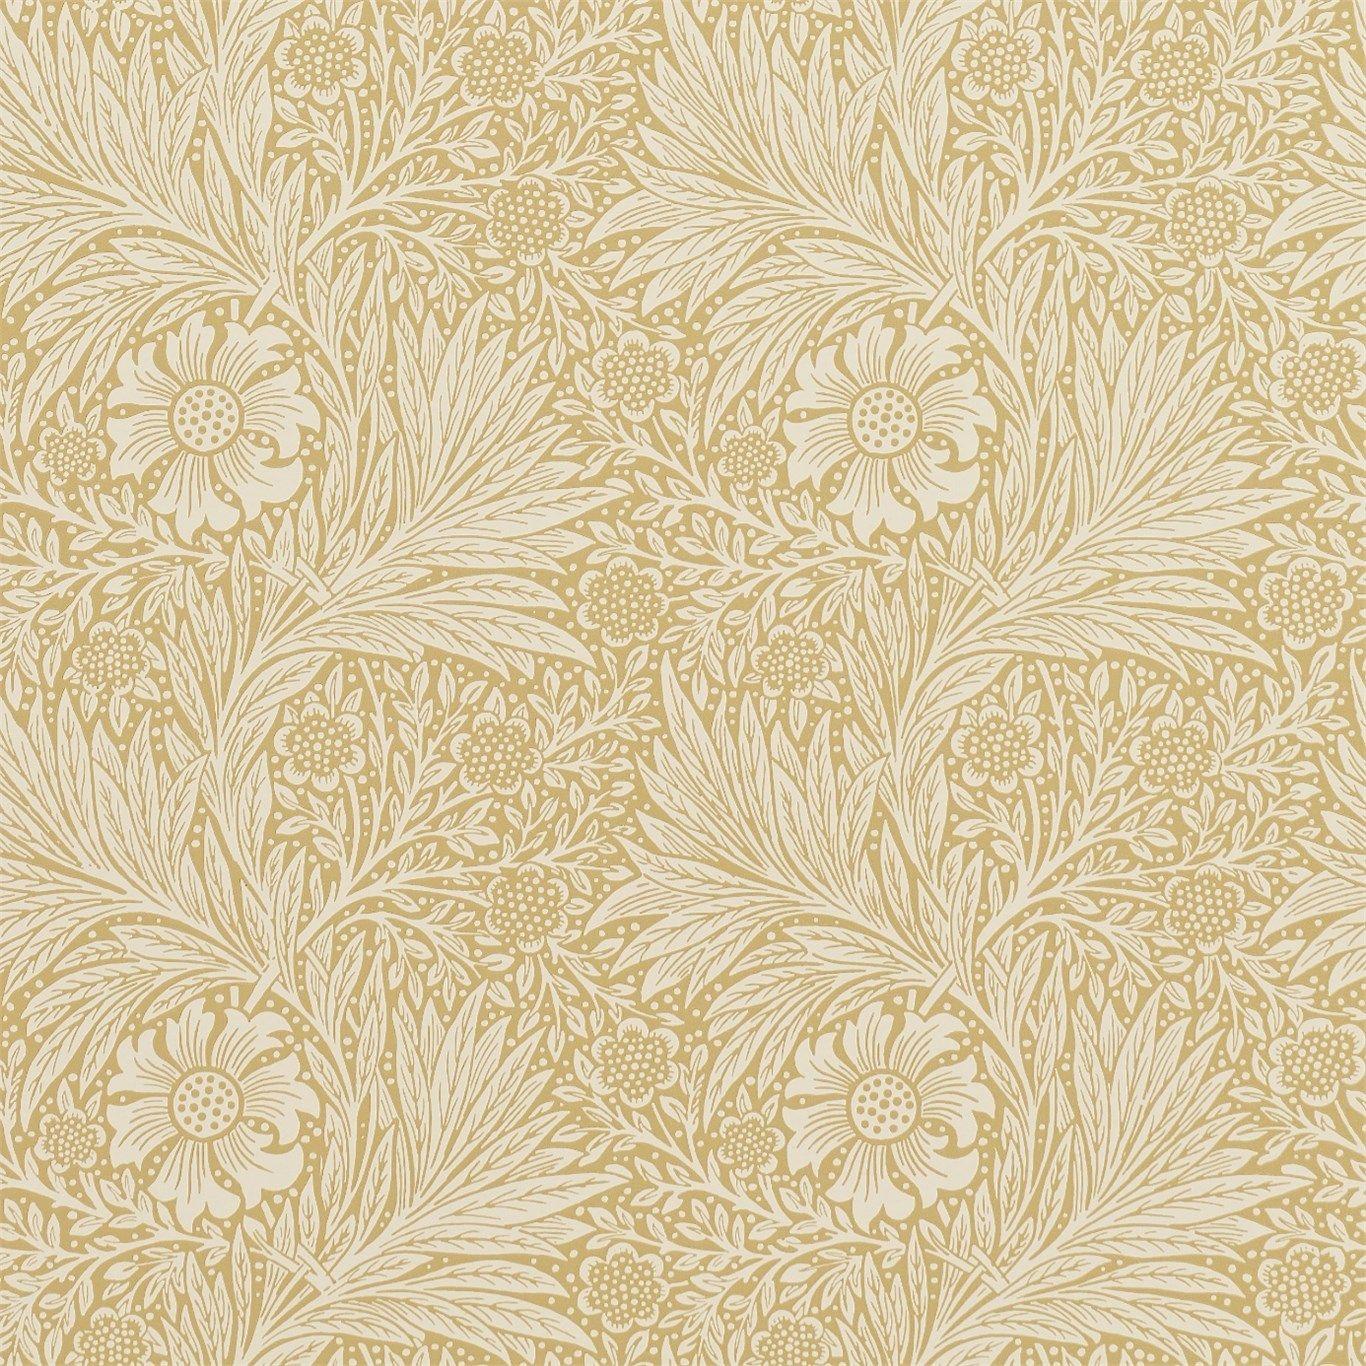 The Original Morris & Co - Arts and crafts, fabrics and wallpaper ...